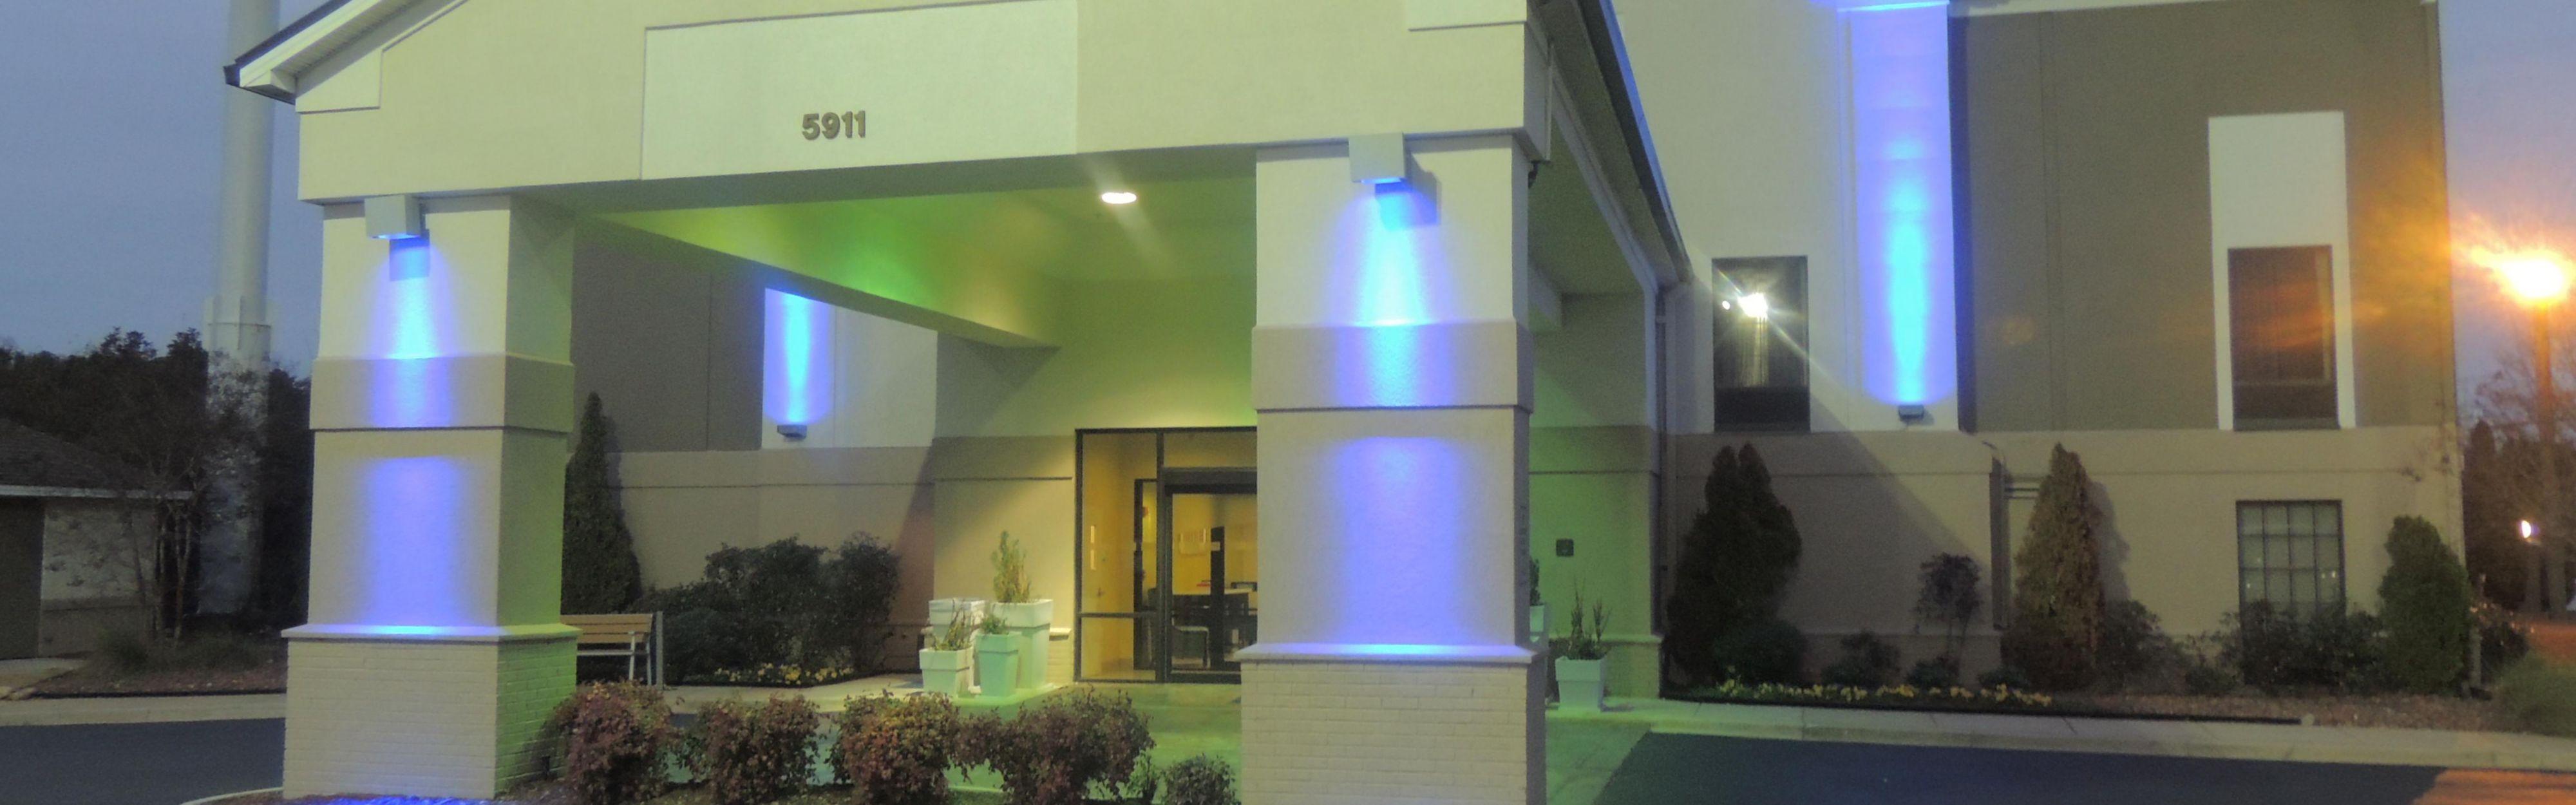 Holiday Inn Express & Suites Birmingham NE - Trussville image 0